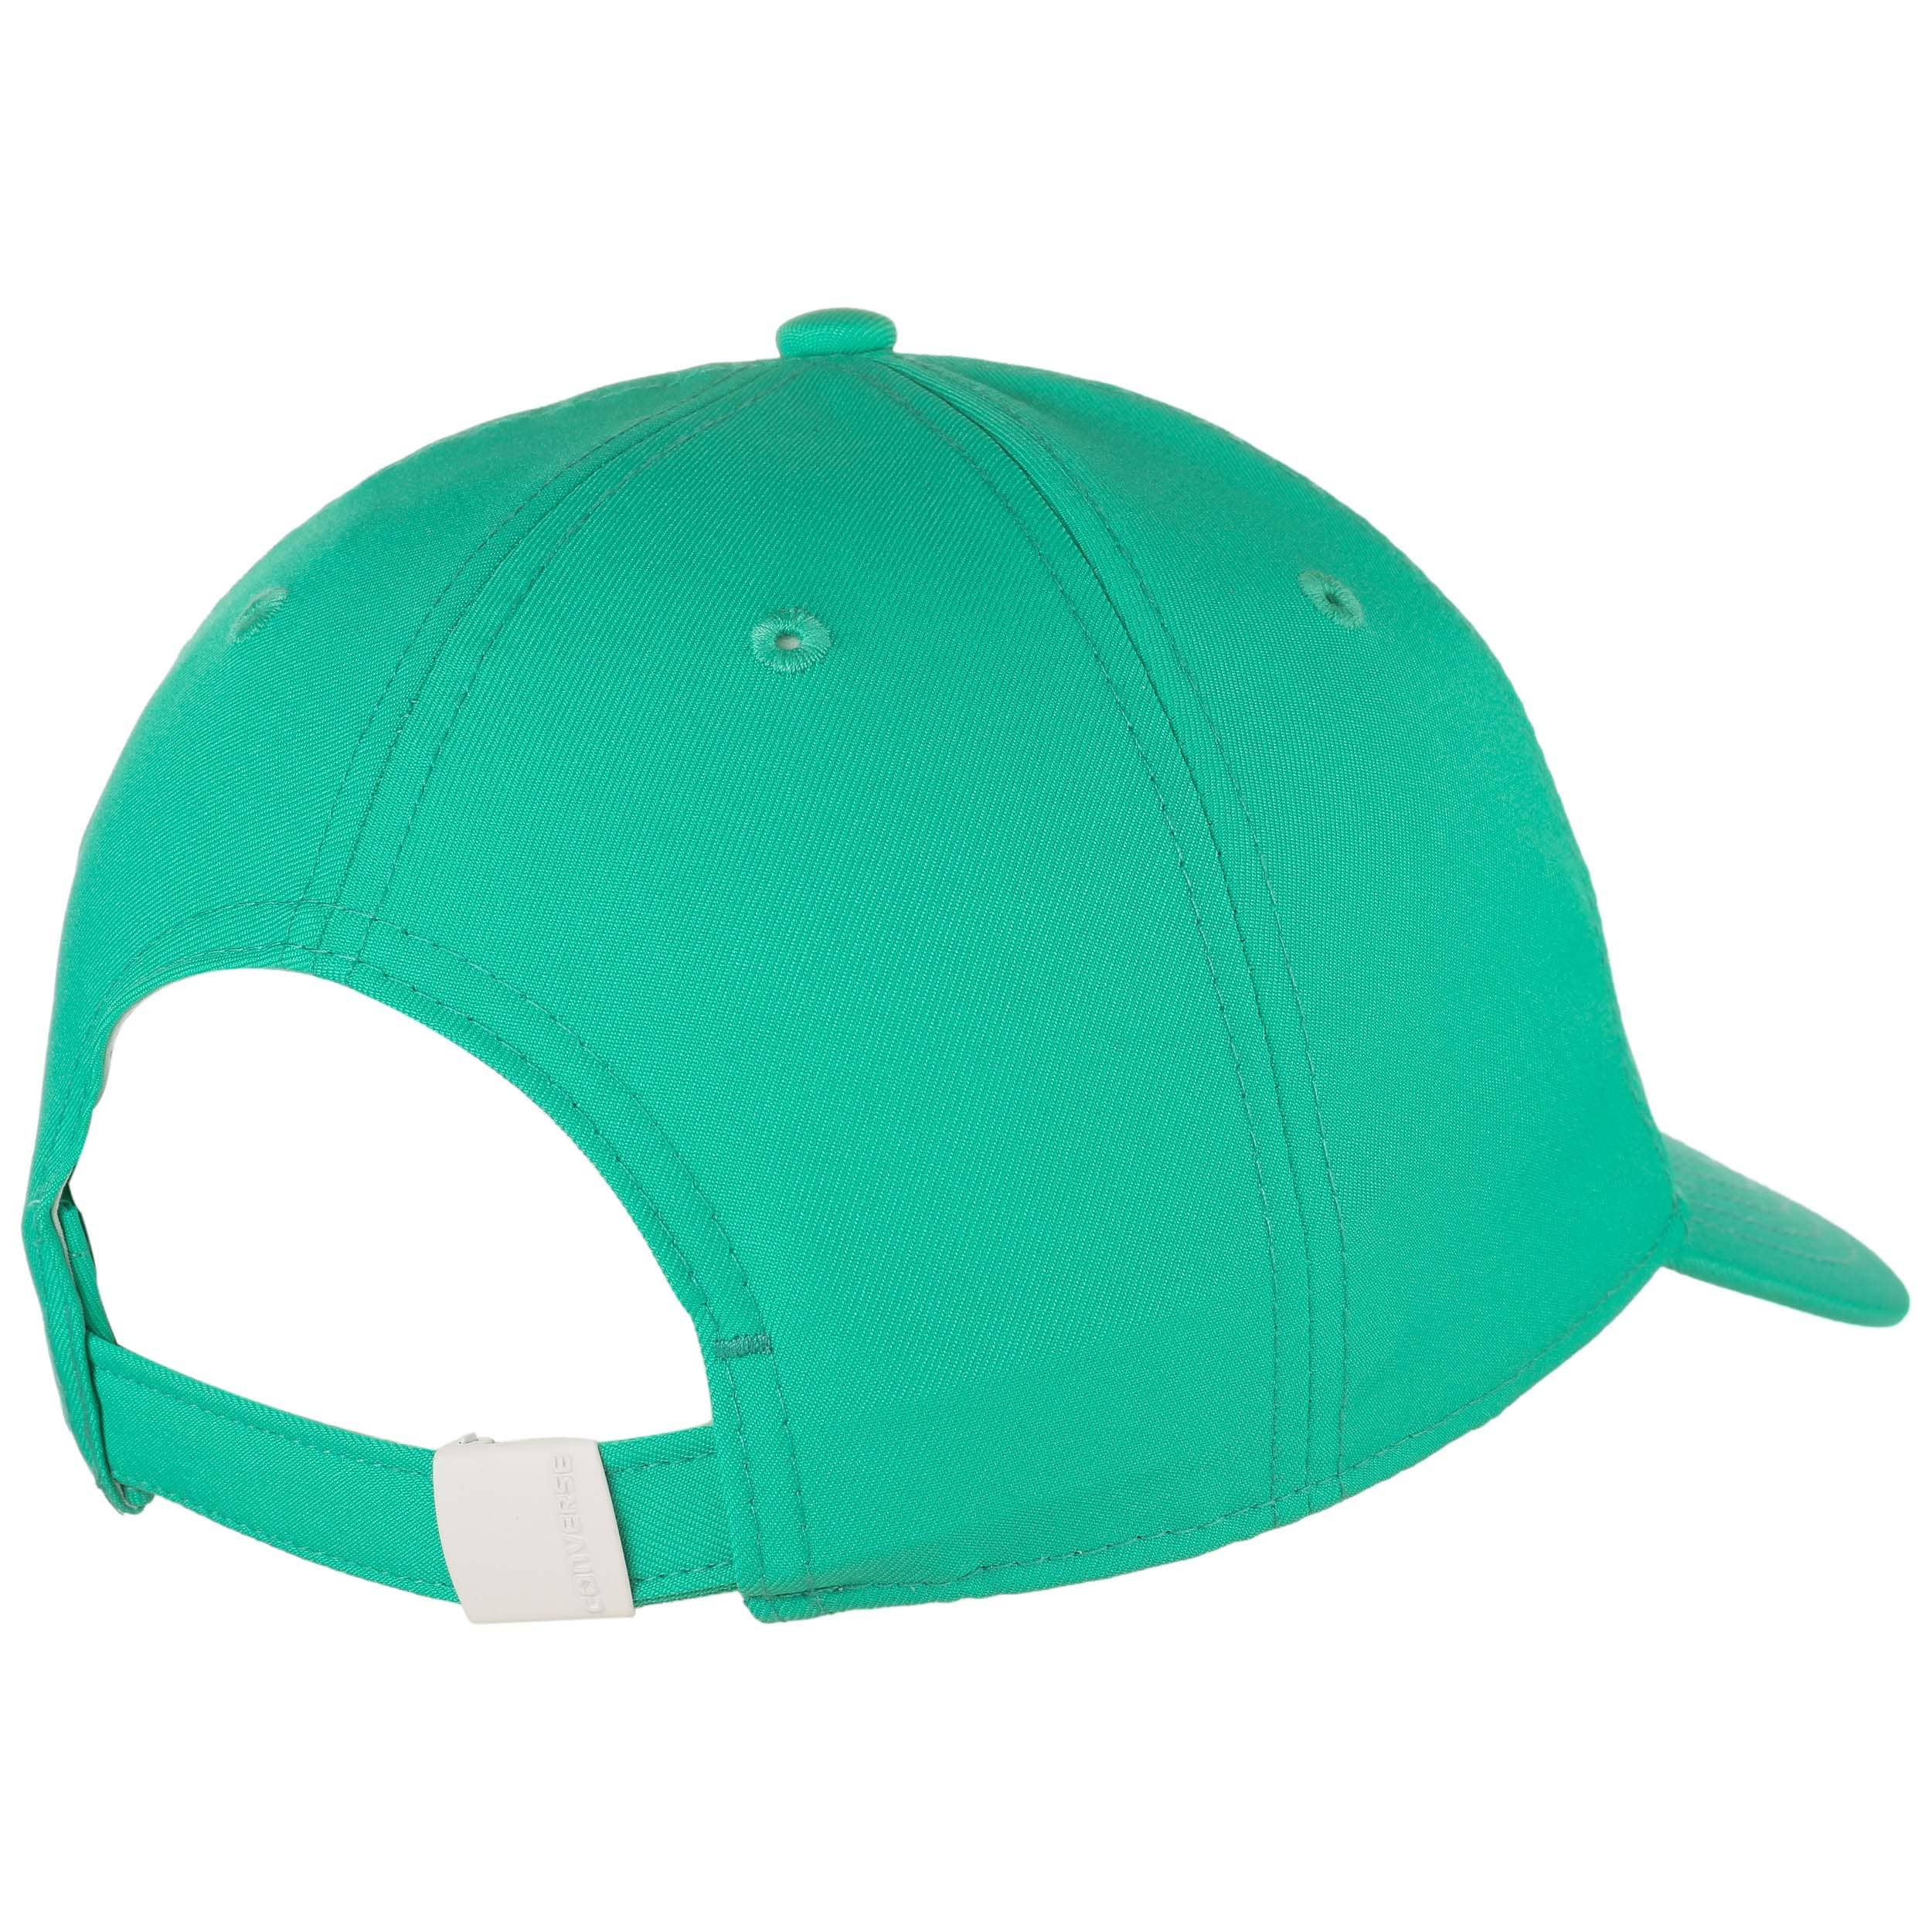 4b5f6af859a ... Dry Short Visor Strapback Cap by Converse - mint green 3 ...